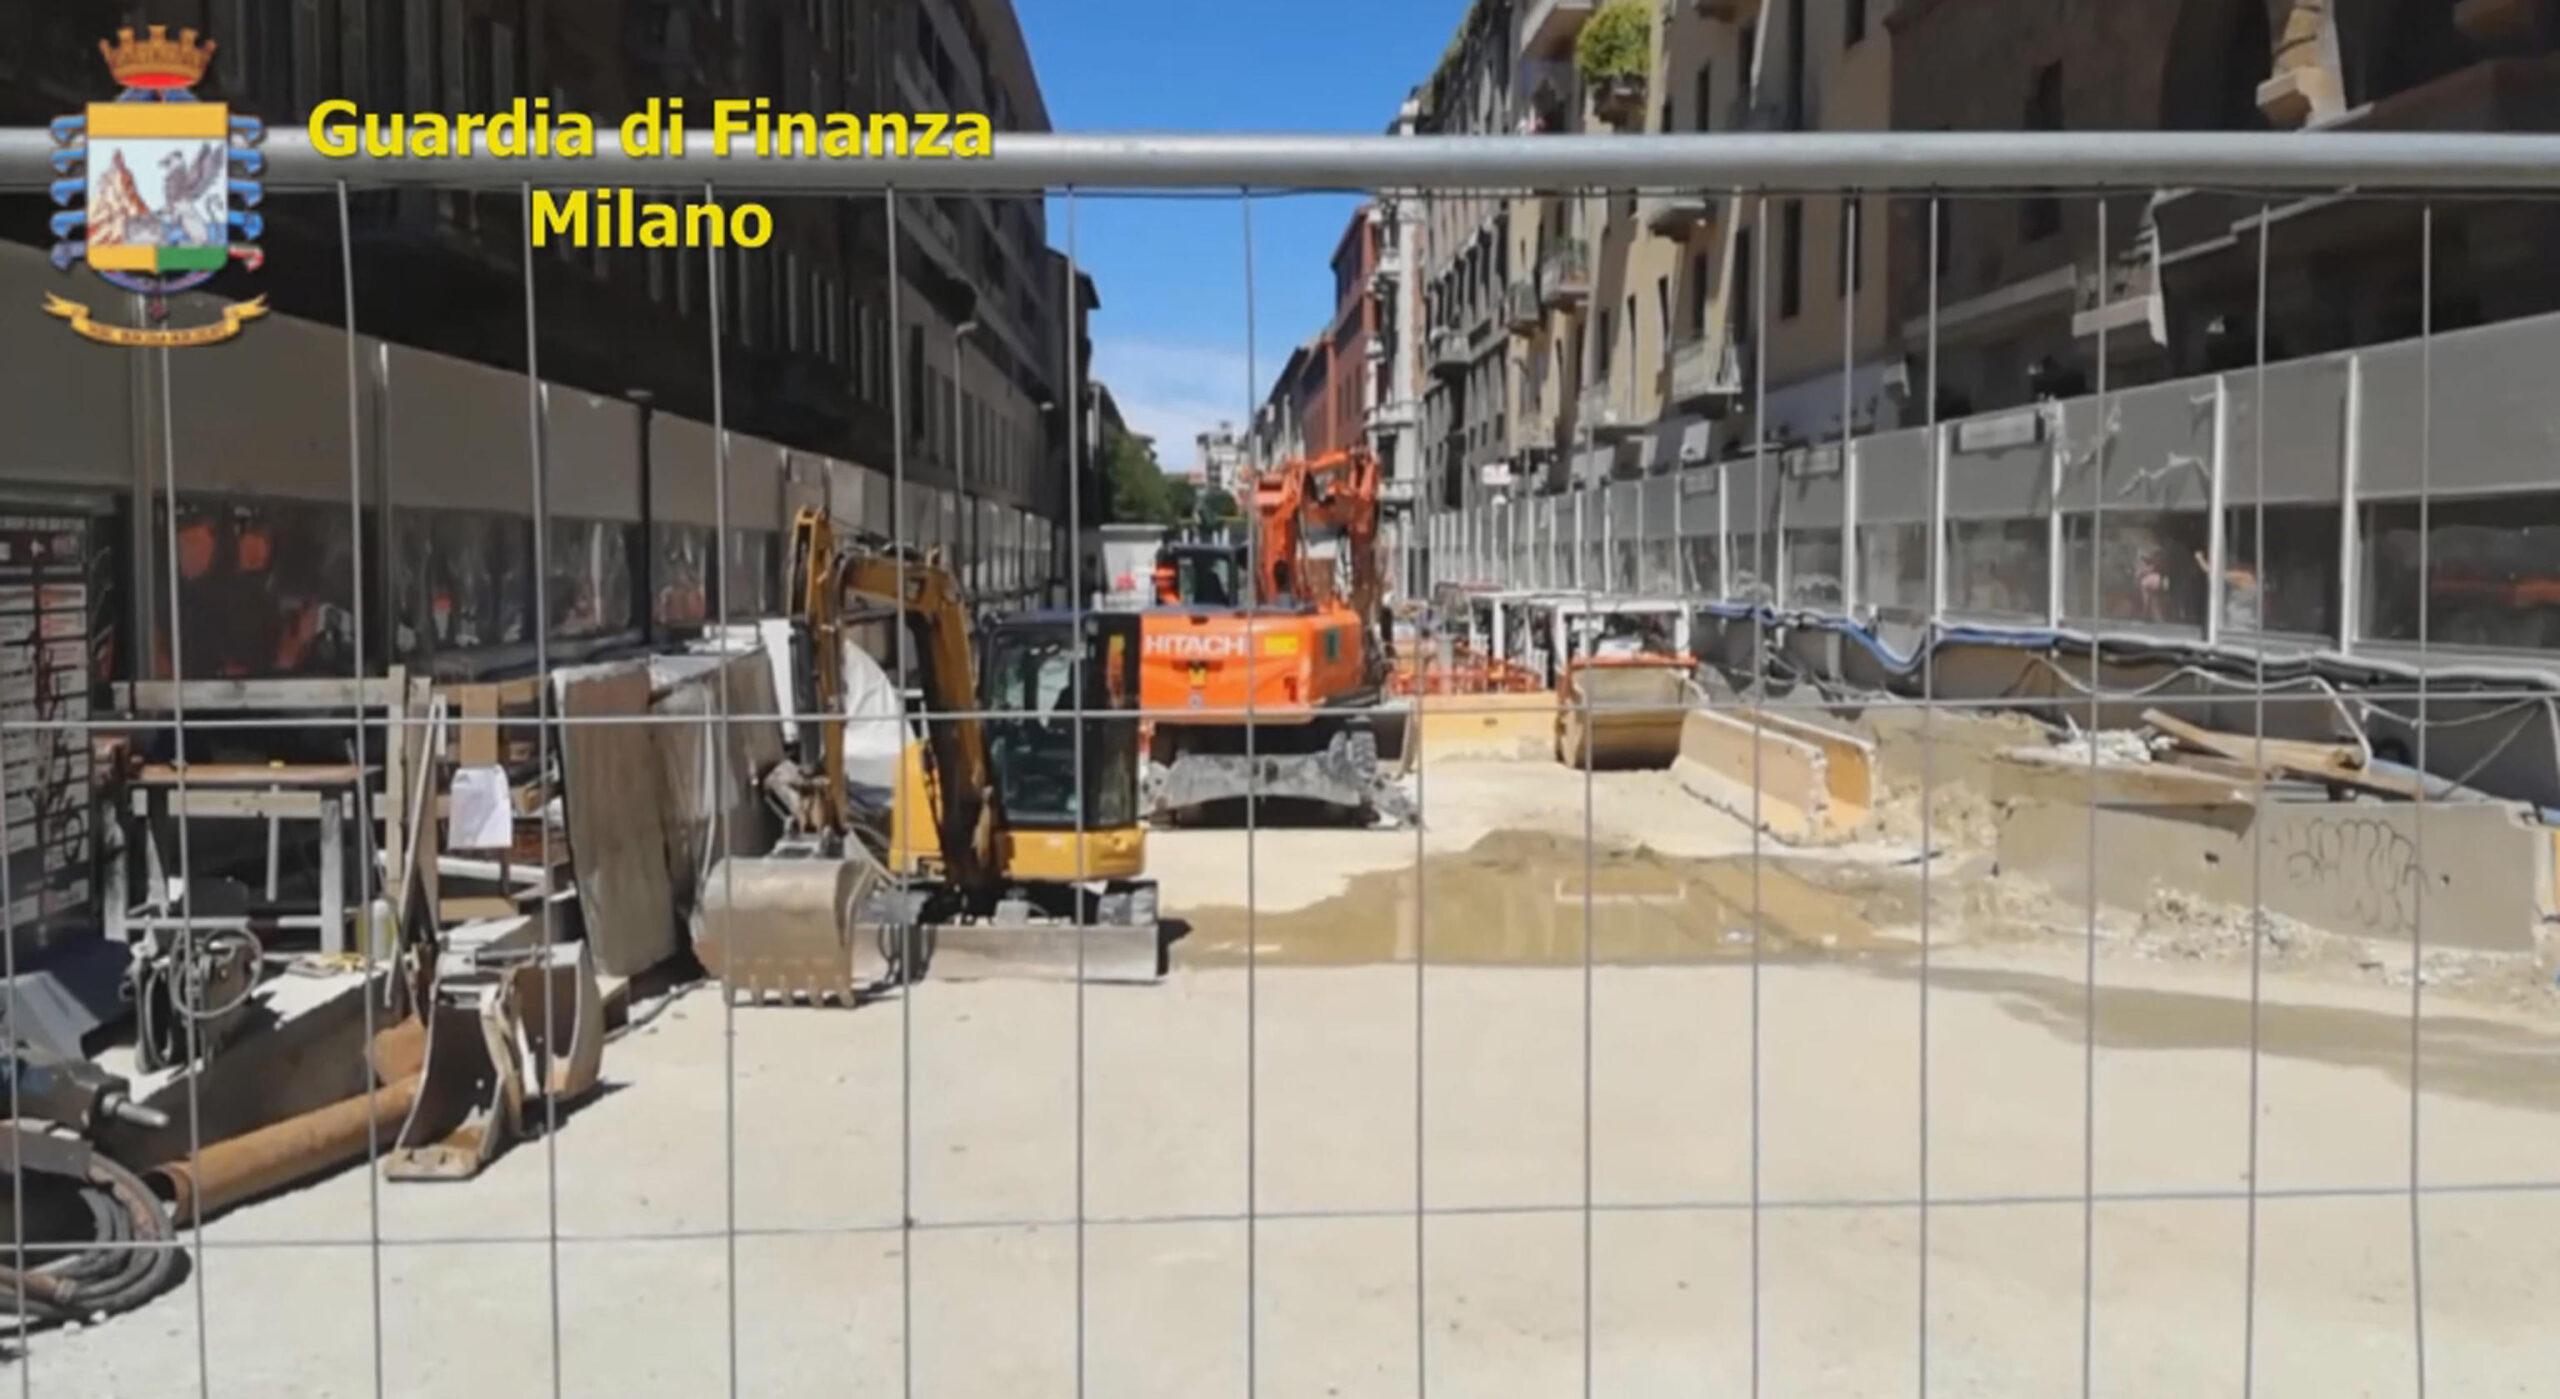 Milano Atm, appalti pilotati, l'inchiesta